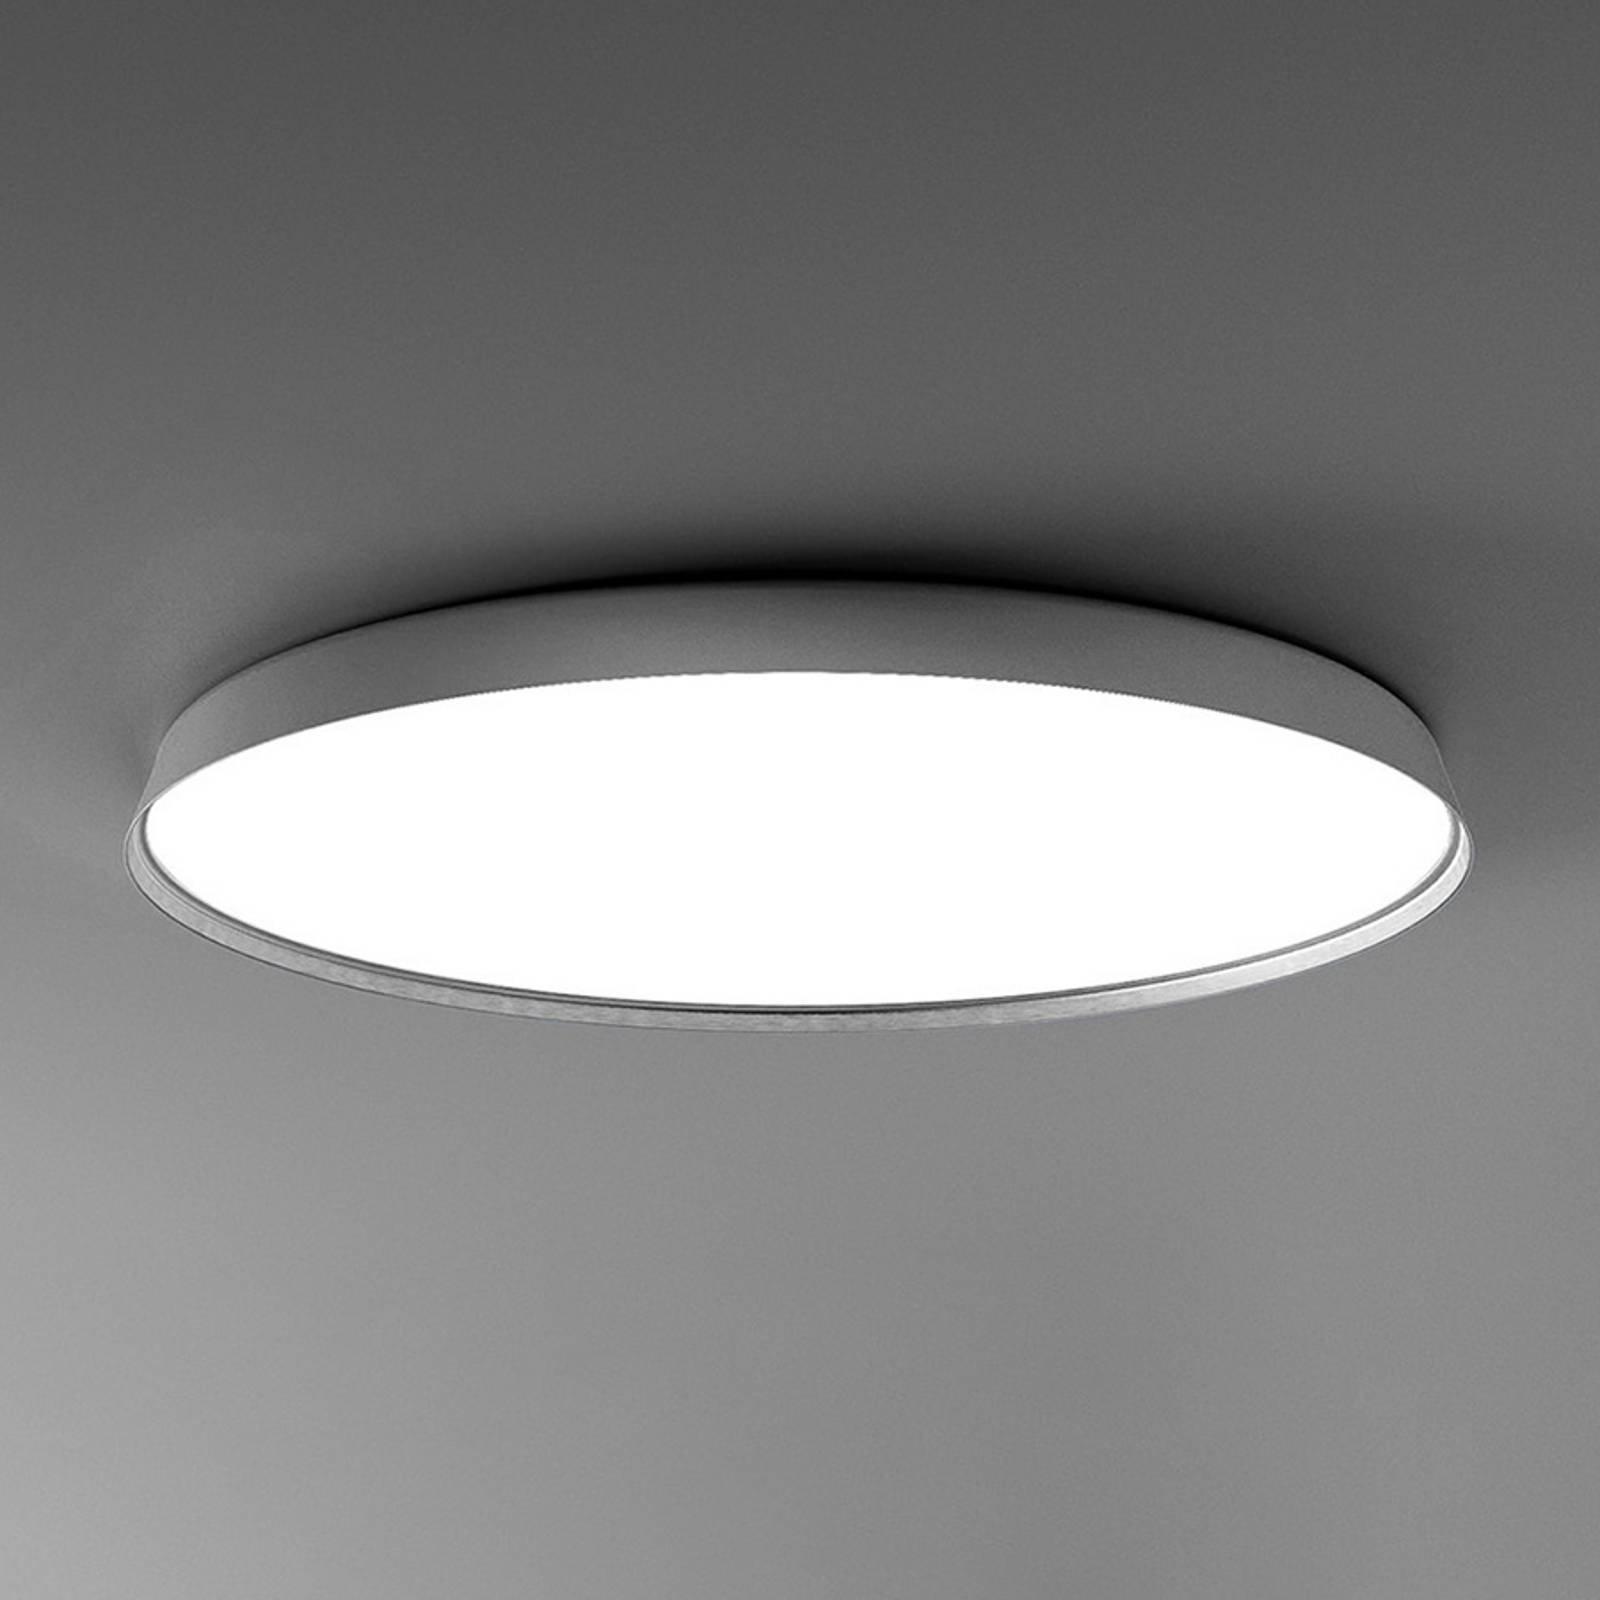 Luceplan Compendium Plate LED-taklampe, alu